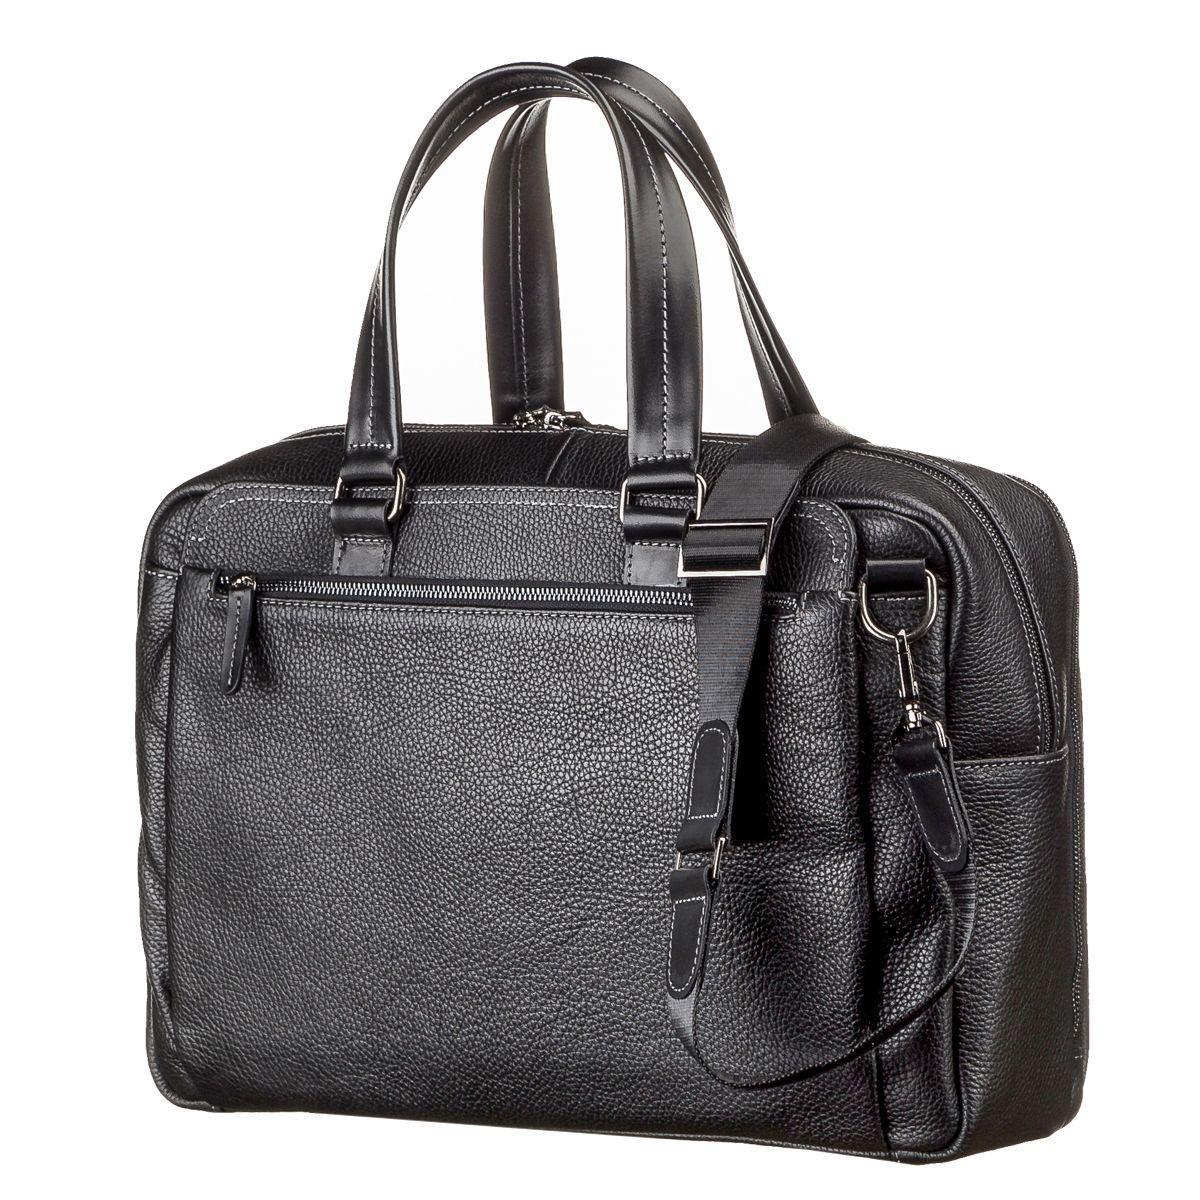 ab7190f75b16 Мужская кожаная сумка через плечо SHVIGEL 11123 Черная - Цена ...